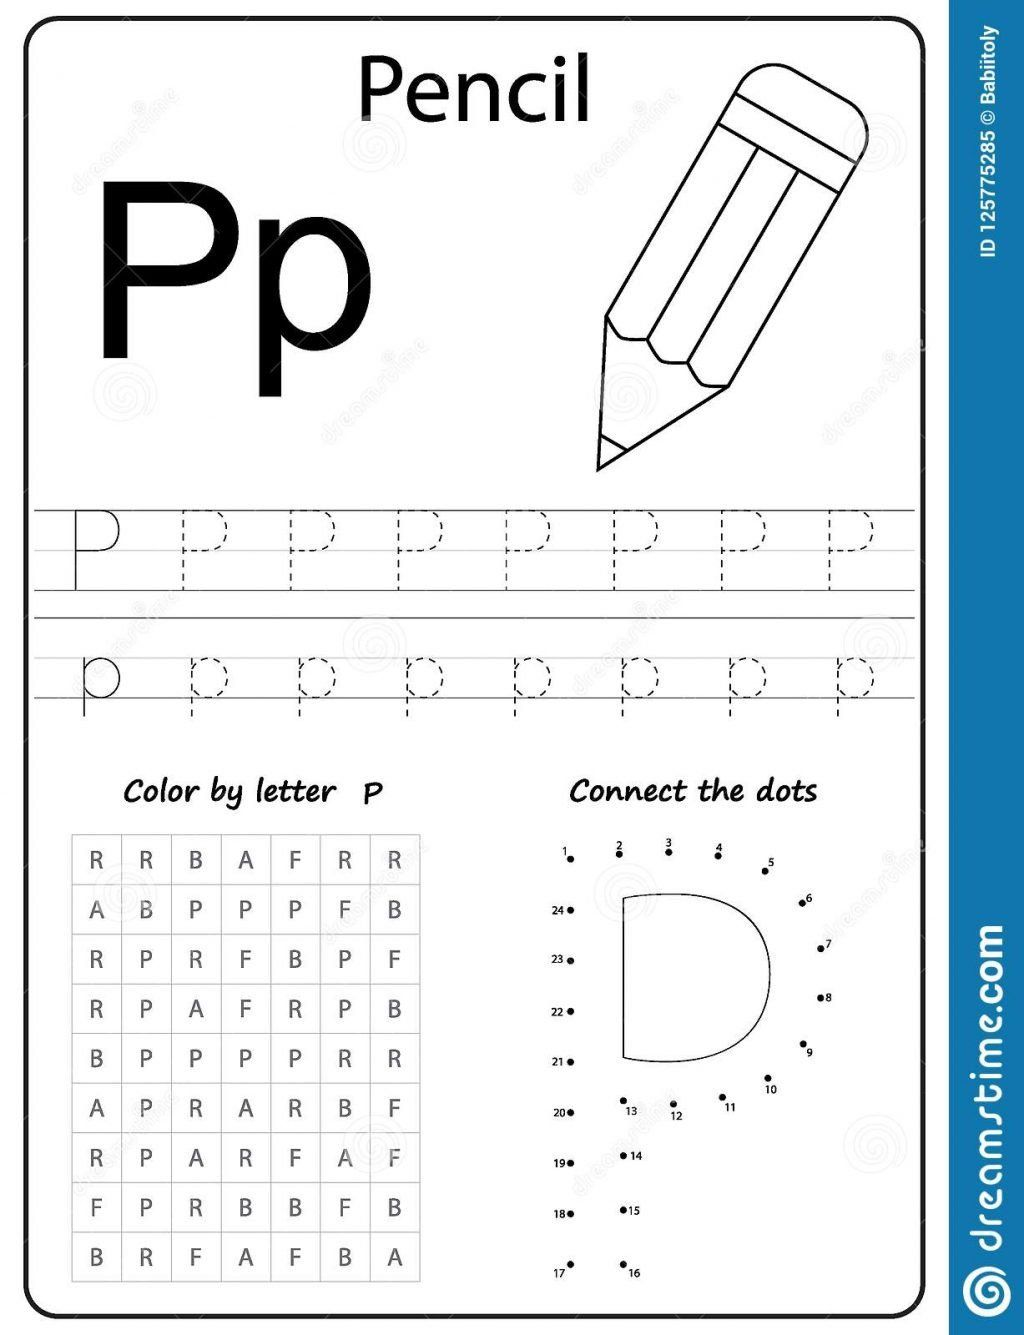 Free Printable Letter P Worksheets Worksheet Ideas